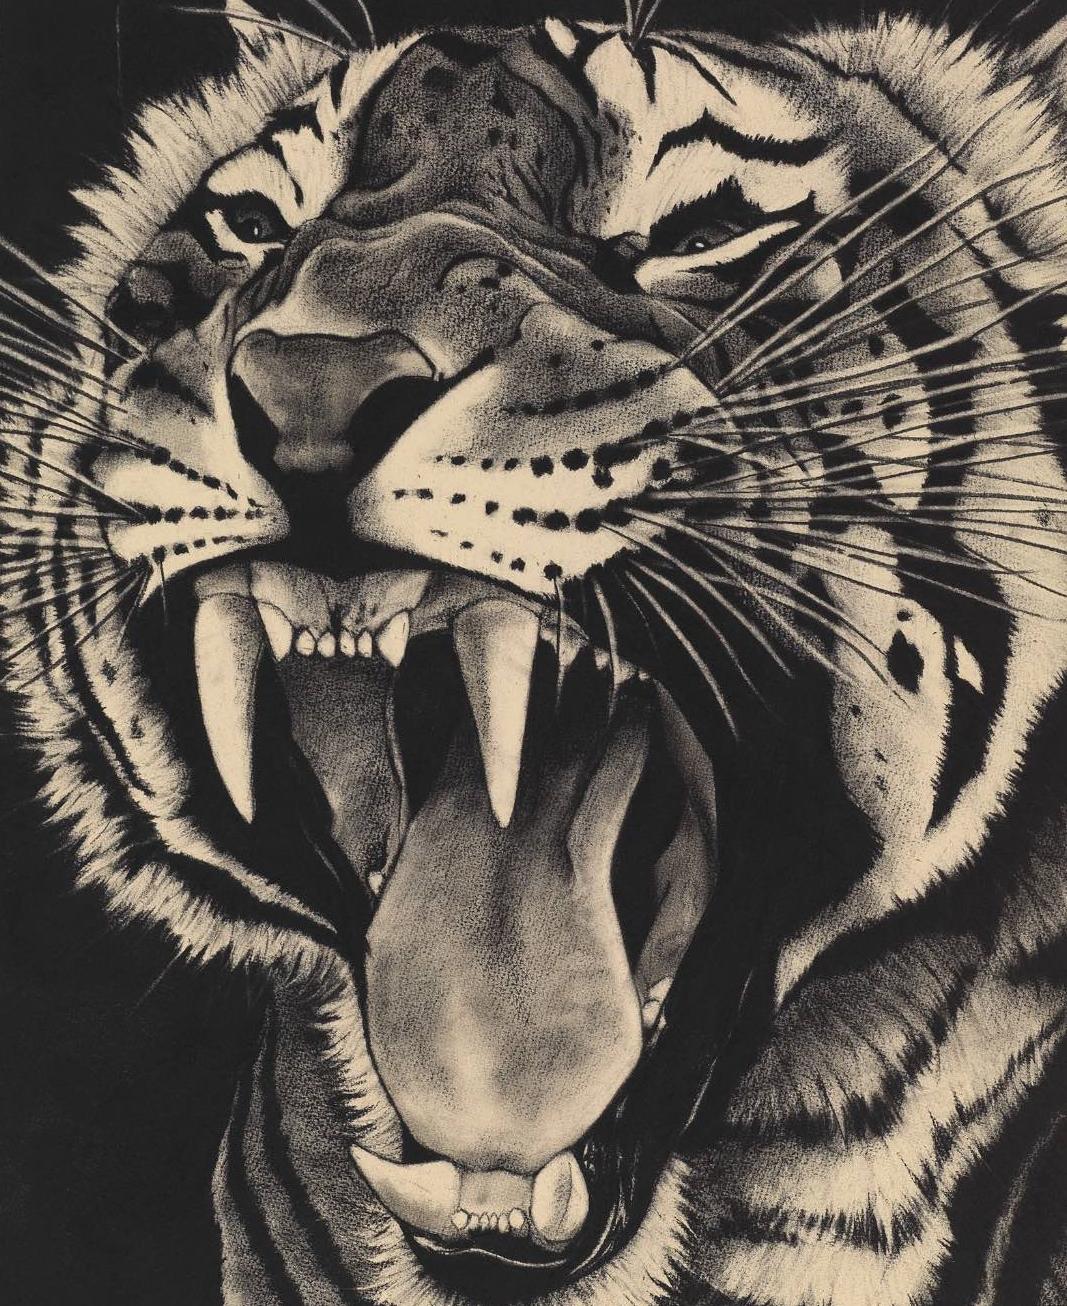 16. SNARLING TIGER ON BLACK